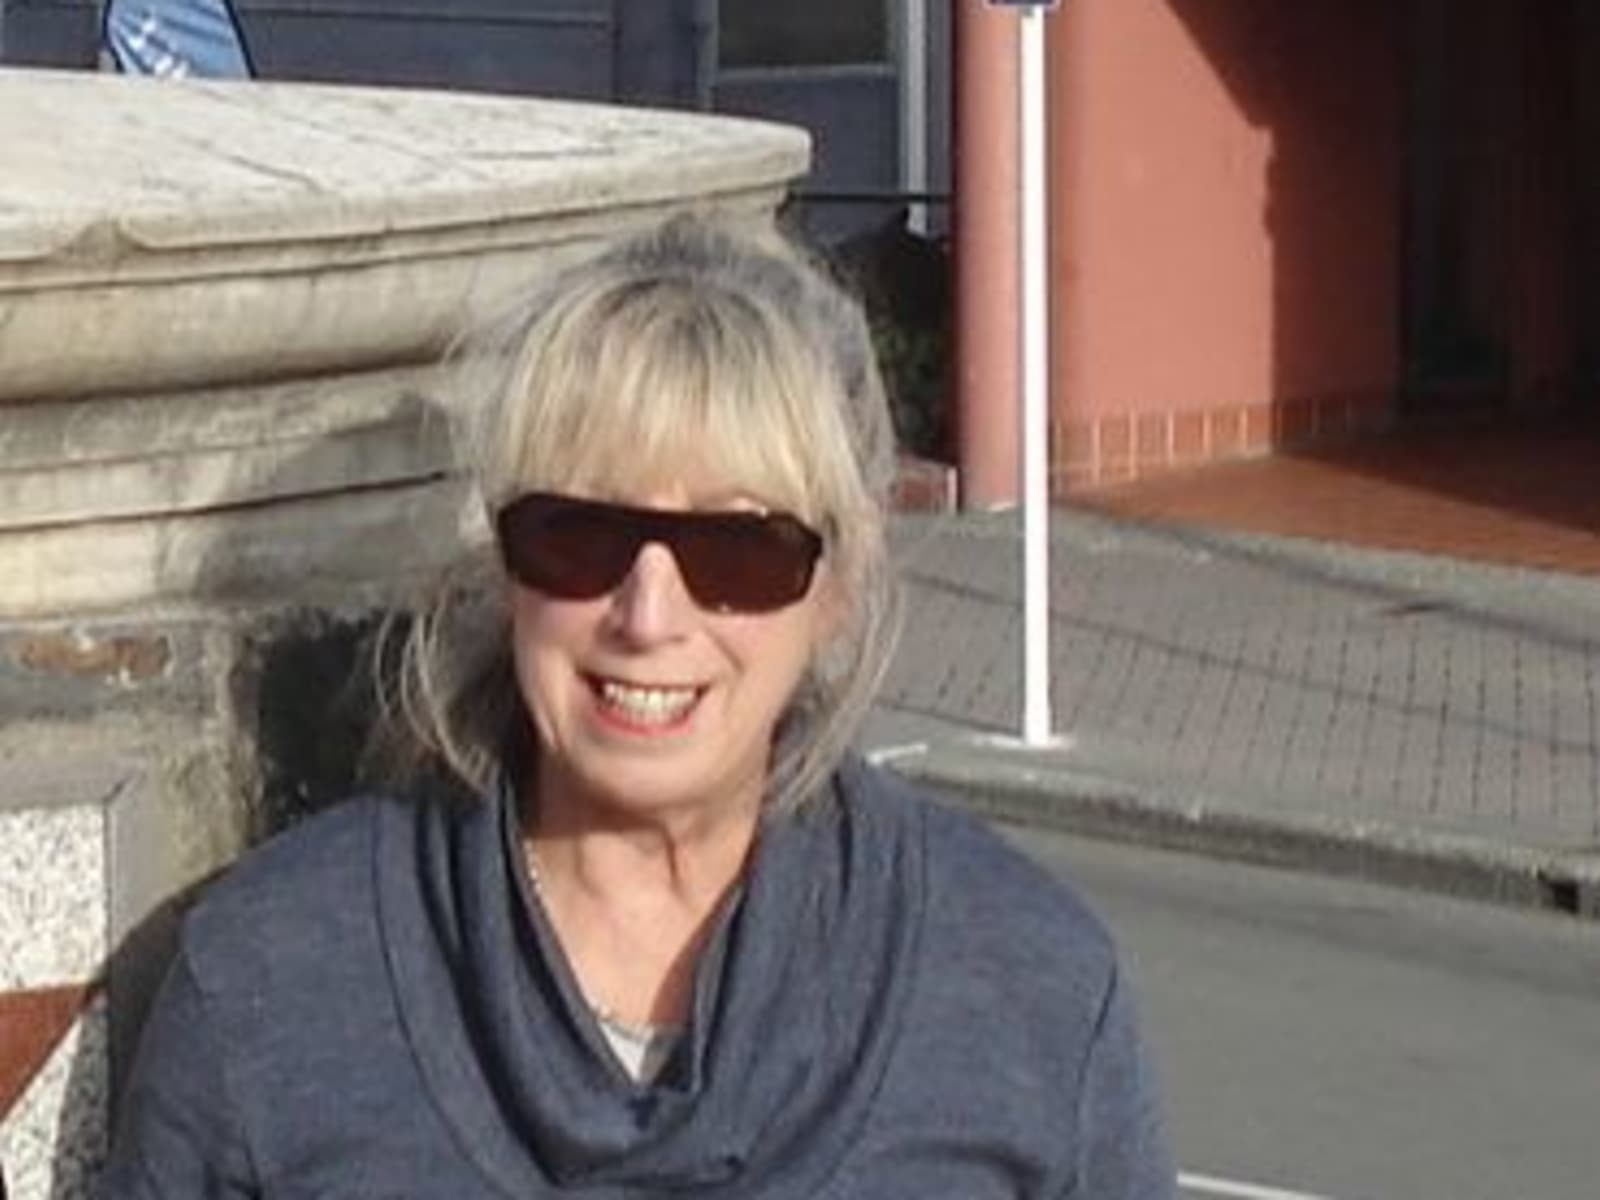 Stephanie from Christchurch, New Zealand